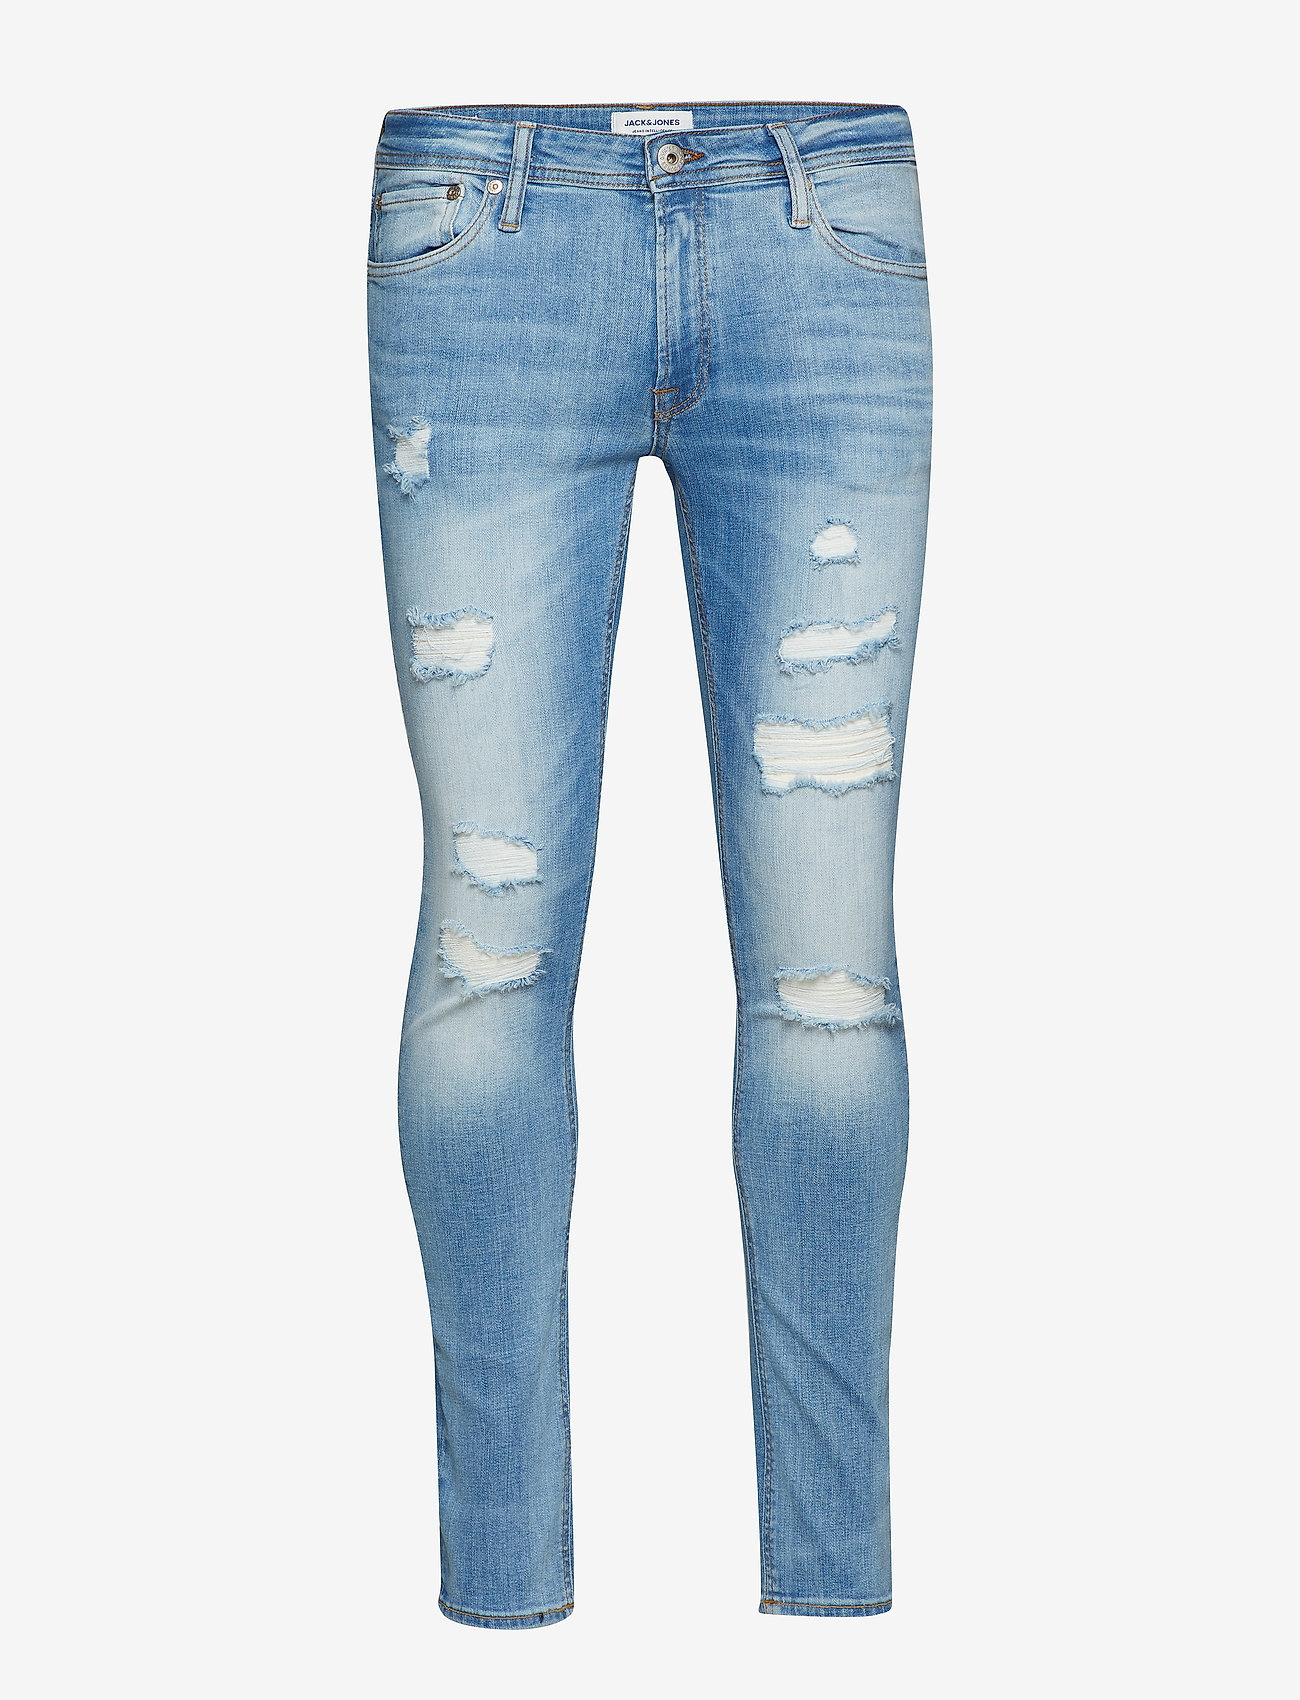 Jack & Jones - JJILIAM JJORIGINAL AM 793 50SPS NOOS - skinny jeans - blue denim - 0